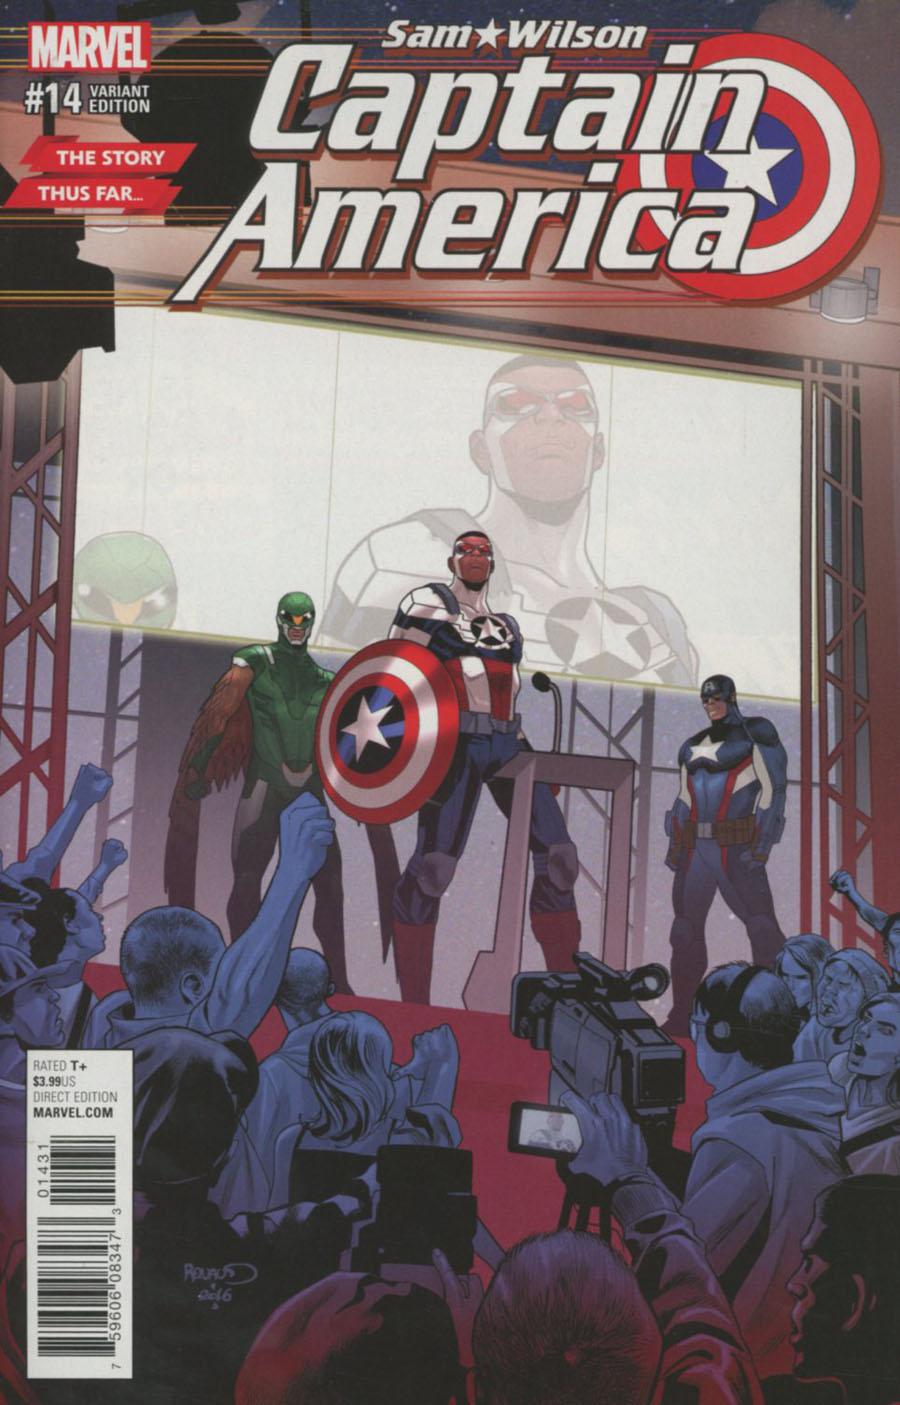 Captain America Sam Wilson #14 Cover C Variant Paul Renaud Story Thus Far Cover (Marvel Now Tie-In)